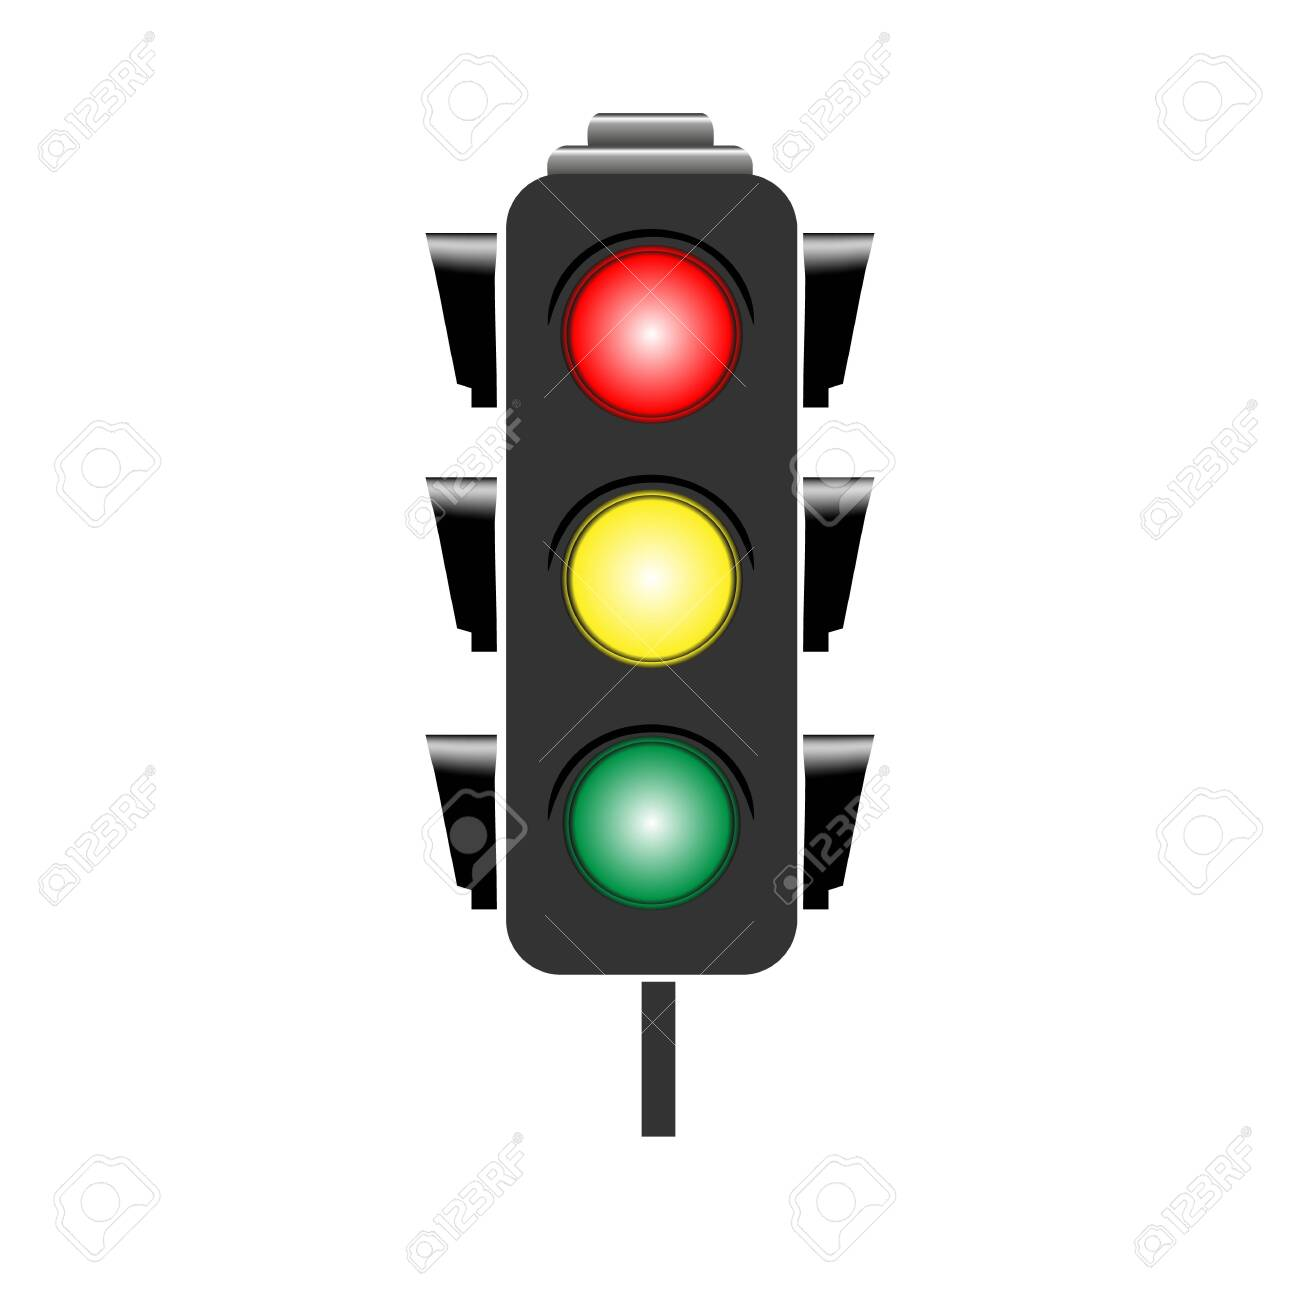 Stoplight sign. Icon traffic light on white background. Symbol regulate movement safety and warning. Electricity semaphore regulate transportation on crossroads urban road. Flat vector illustration - 149907162